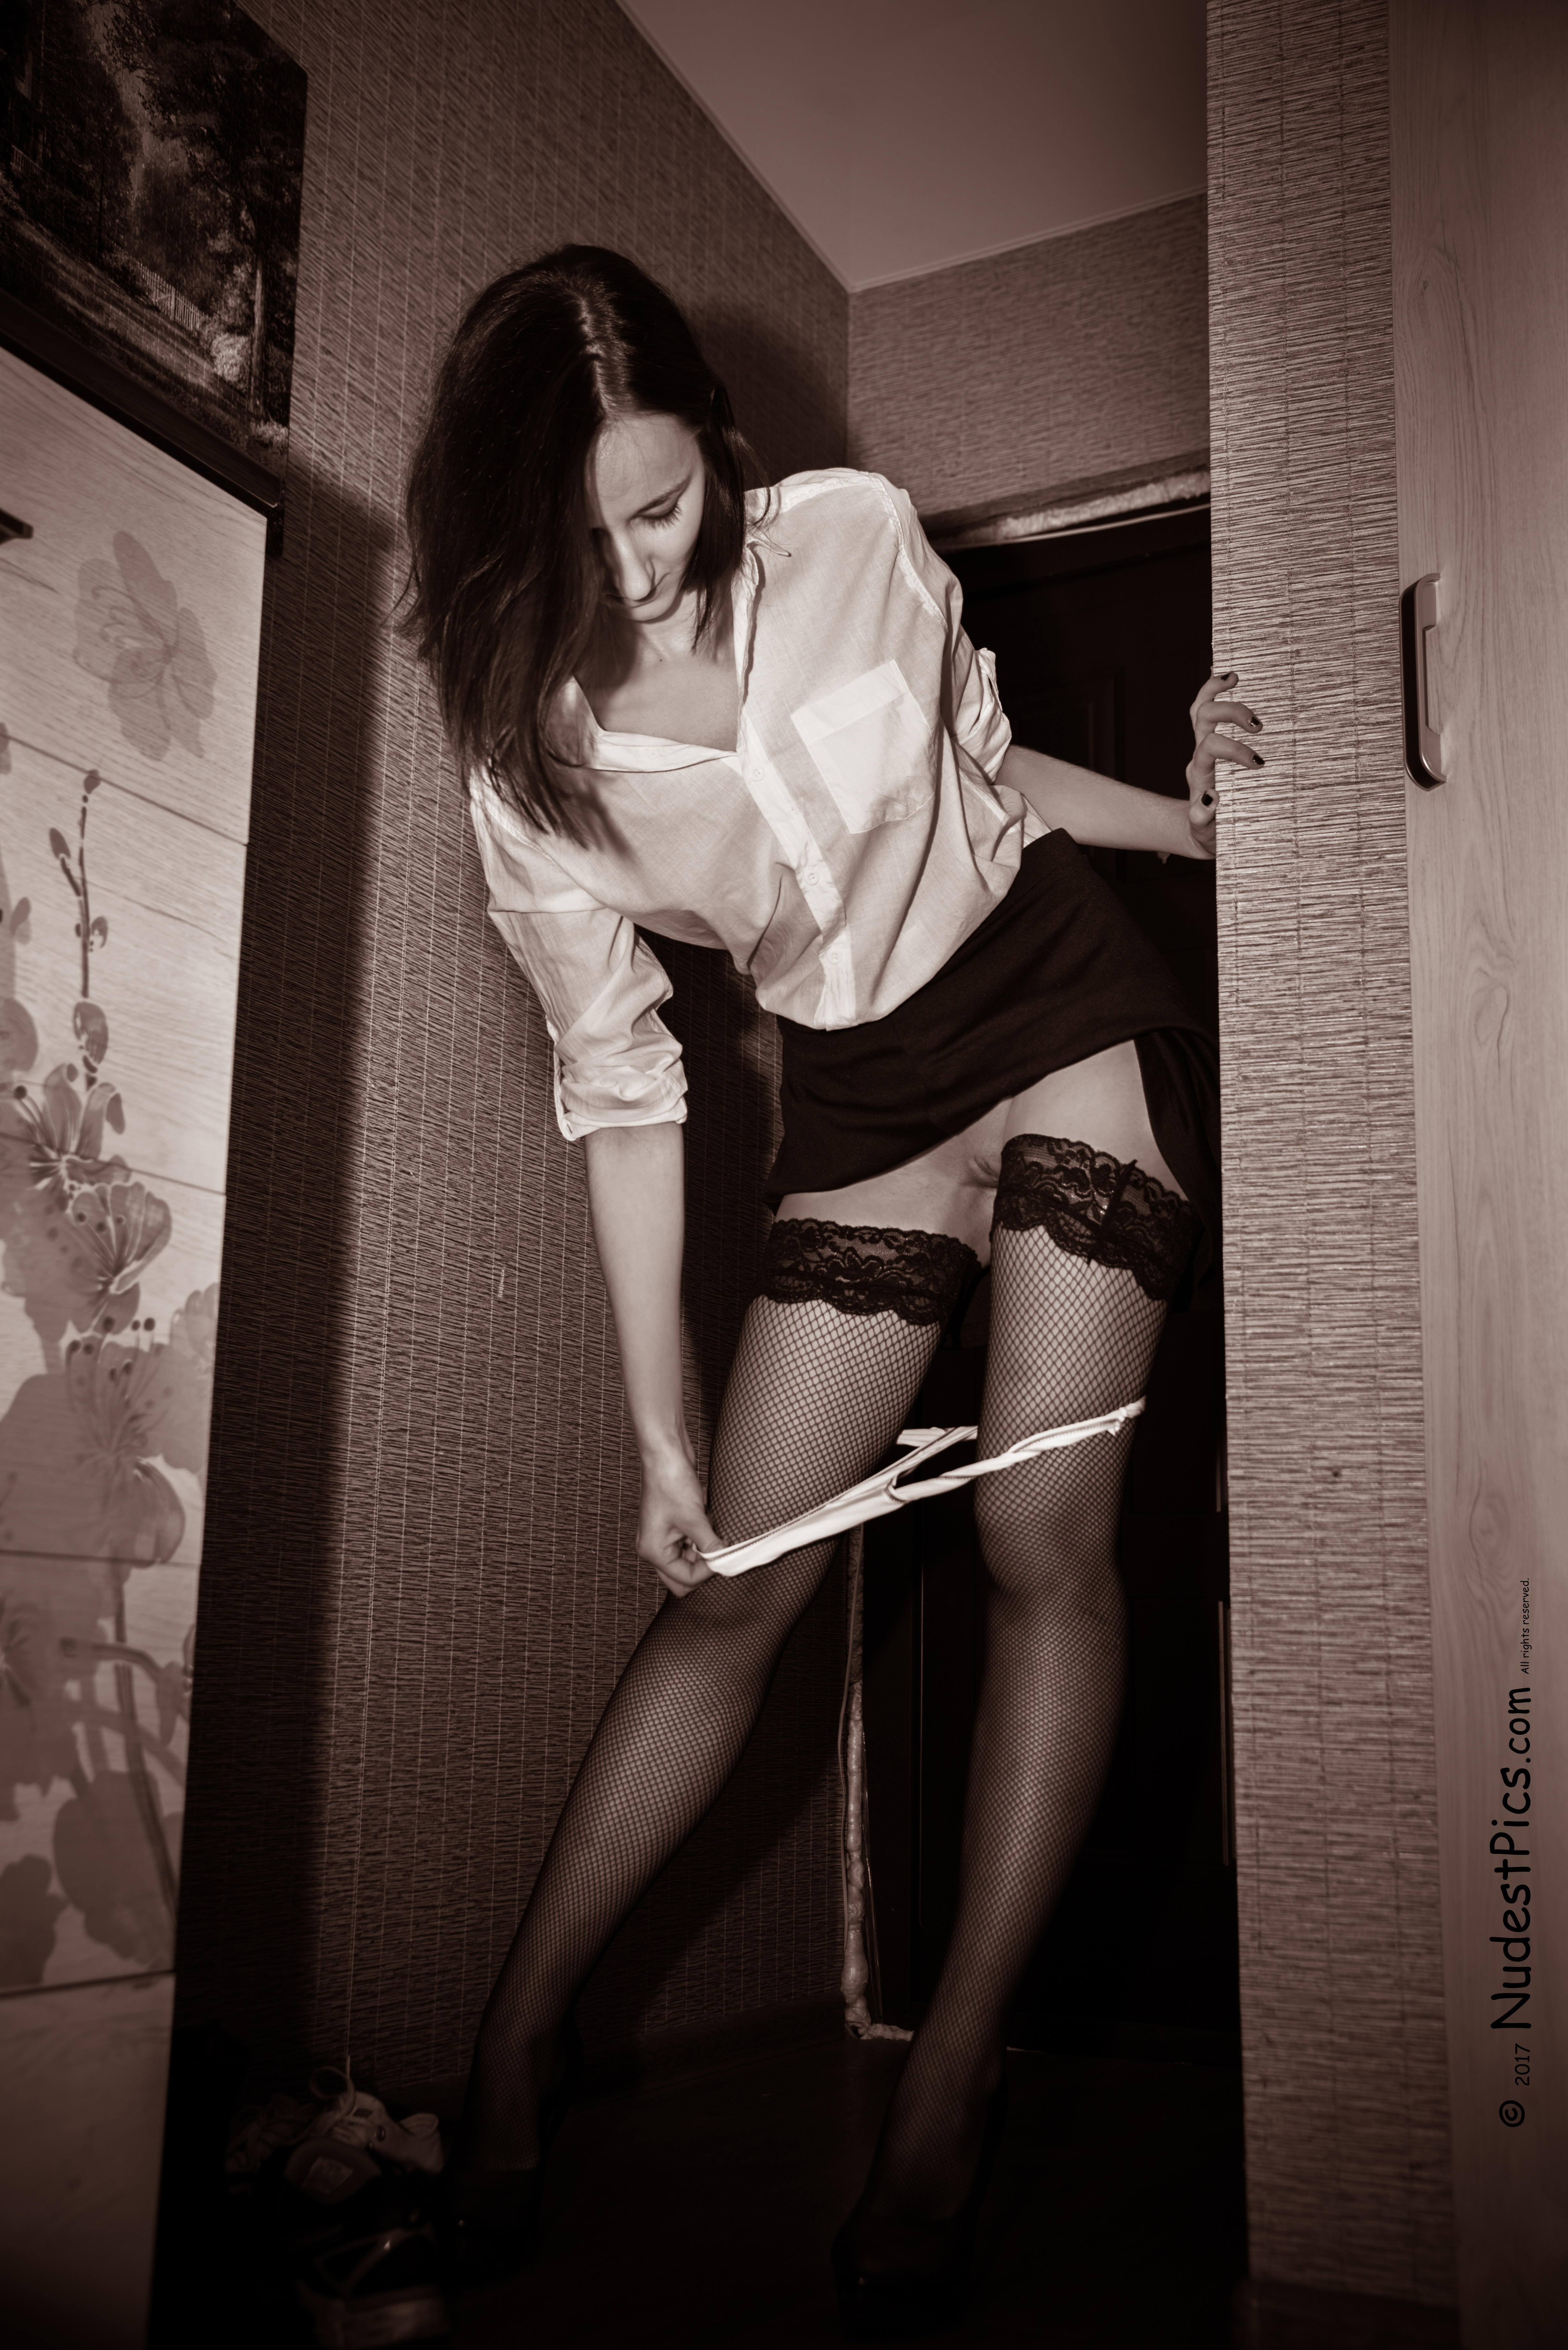 Good Sexy Office GF taking Panties Off